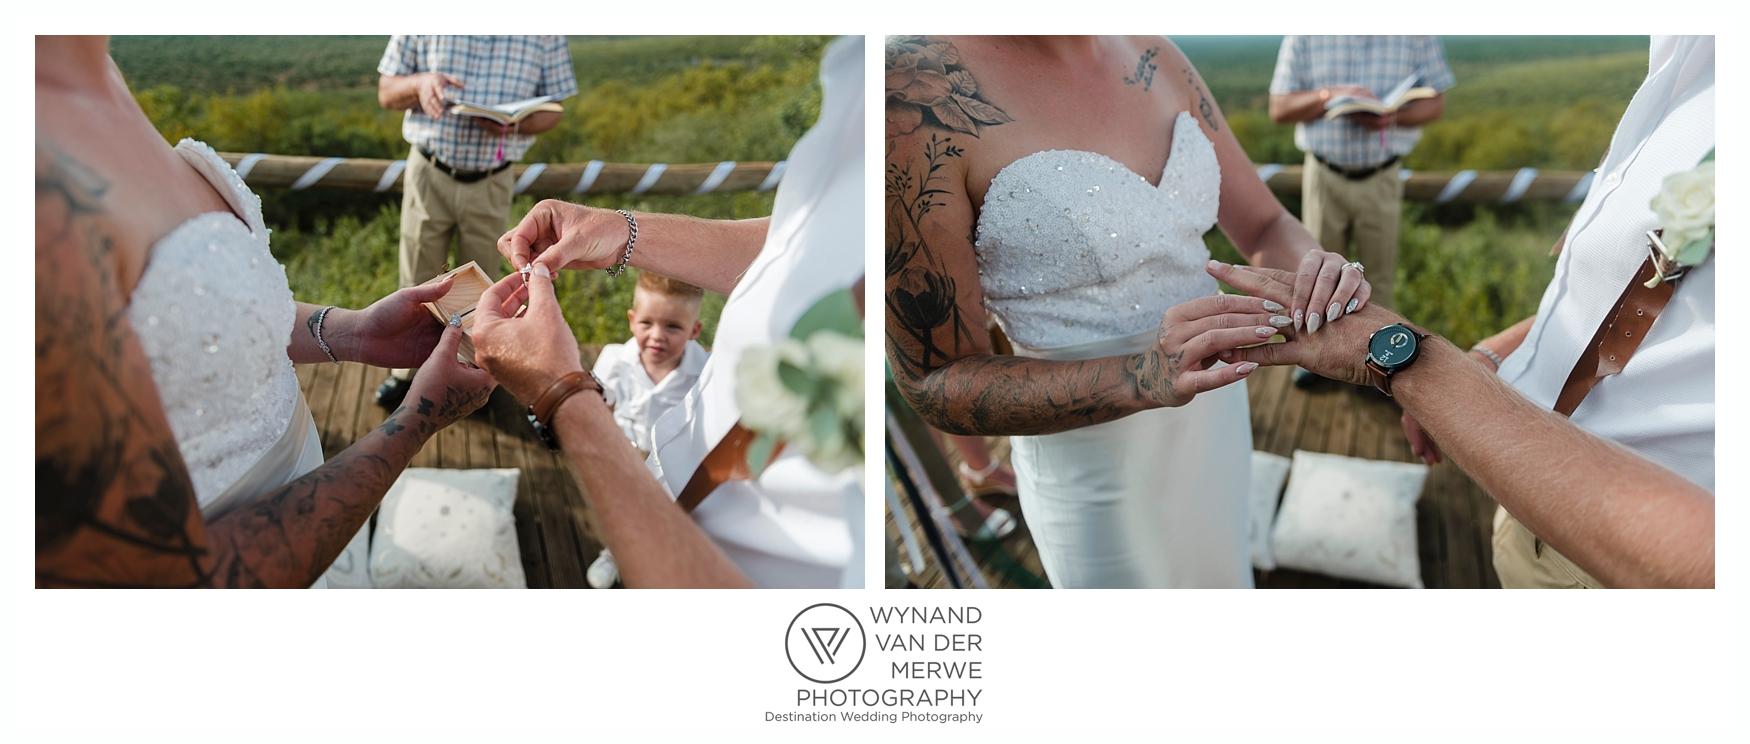 WynandvanderMerwe_weddingphotography_bushveldwedding_northam_bushveld_limpopowedding_limpopo_southafrica-103.jpg